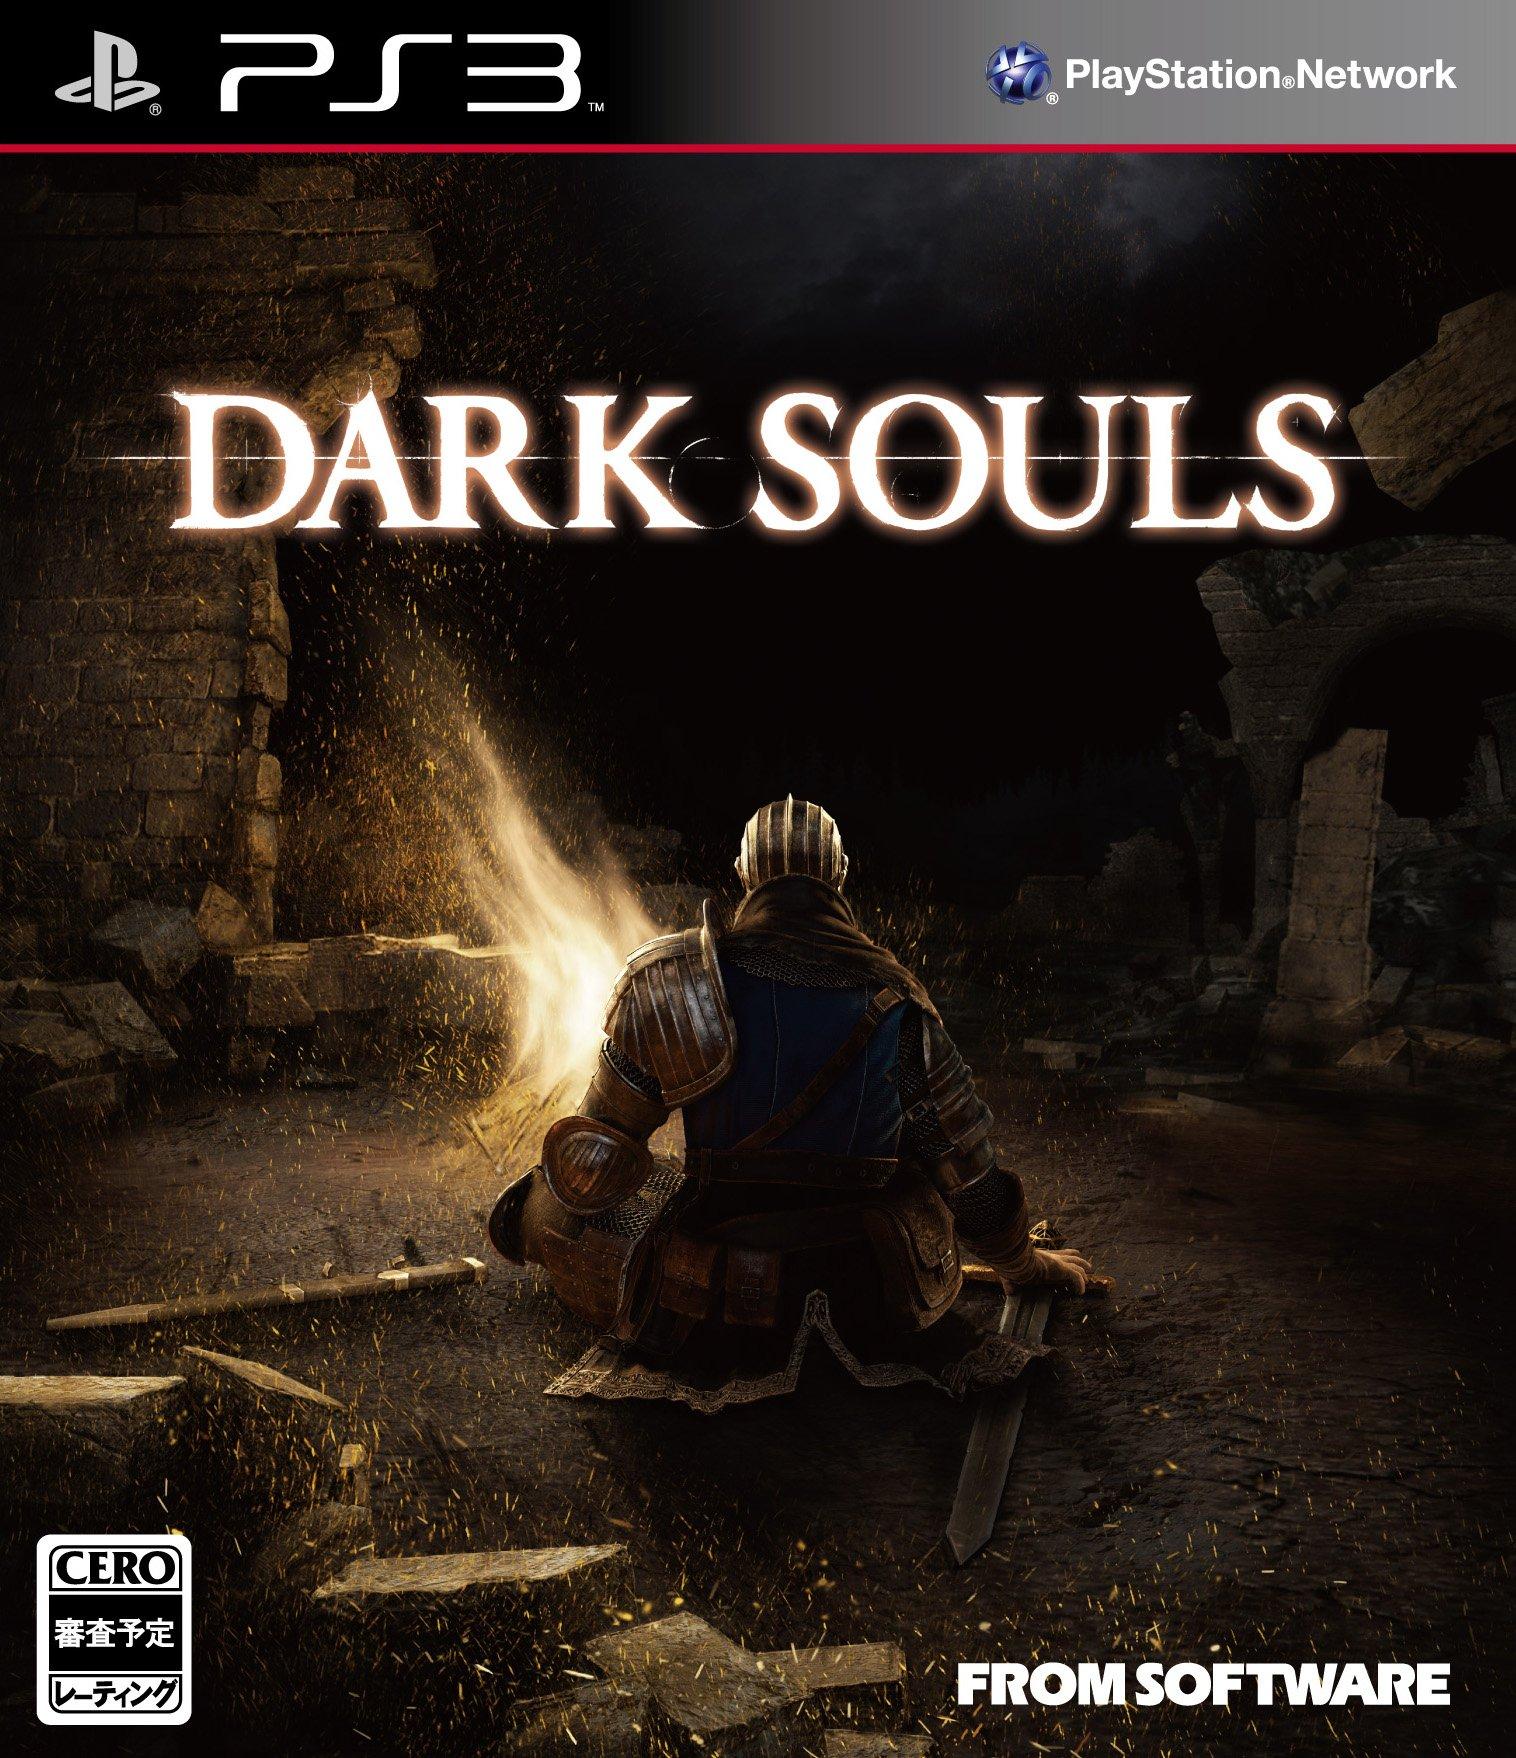 dark souls - cover art